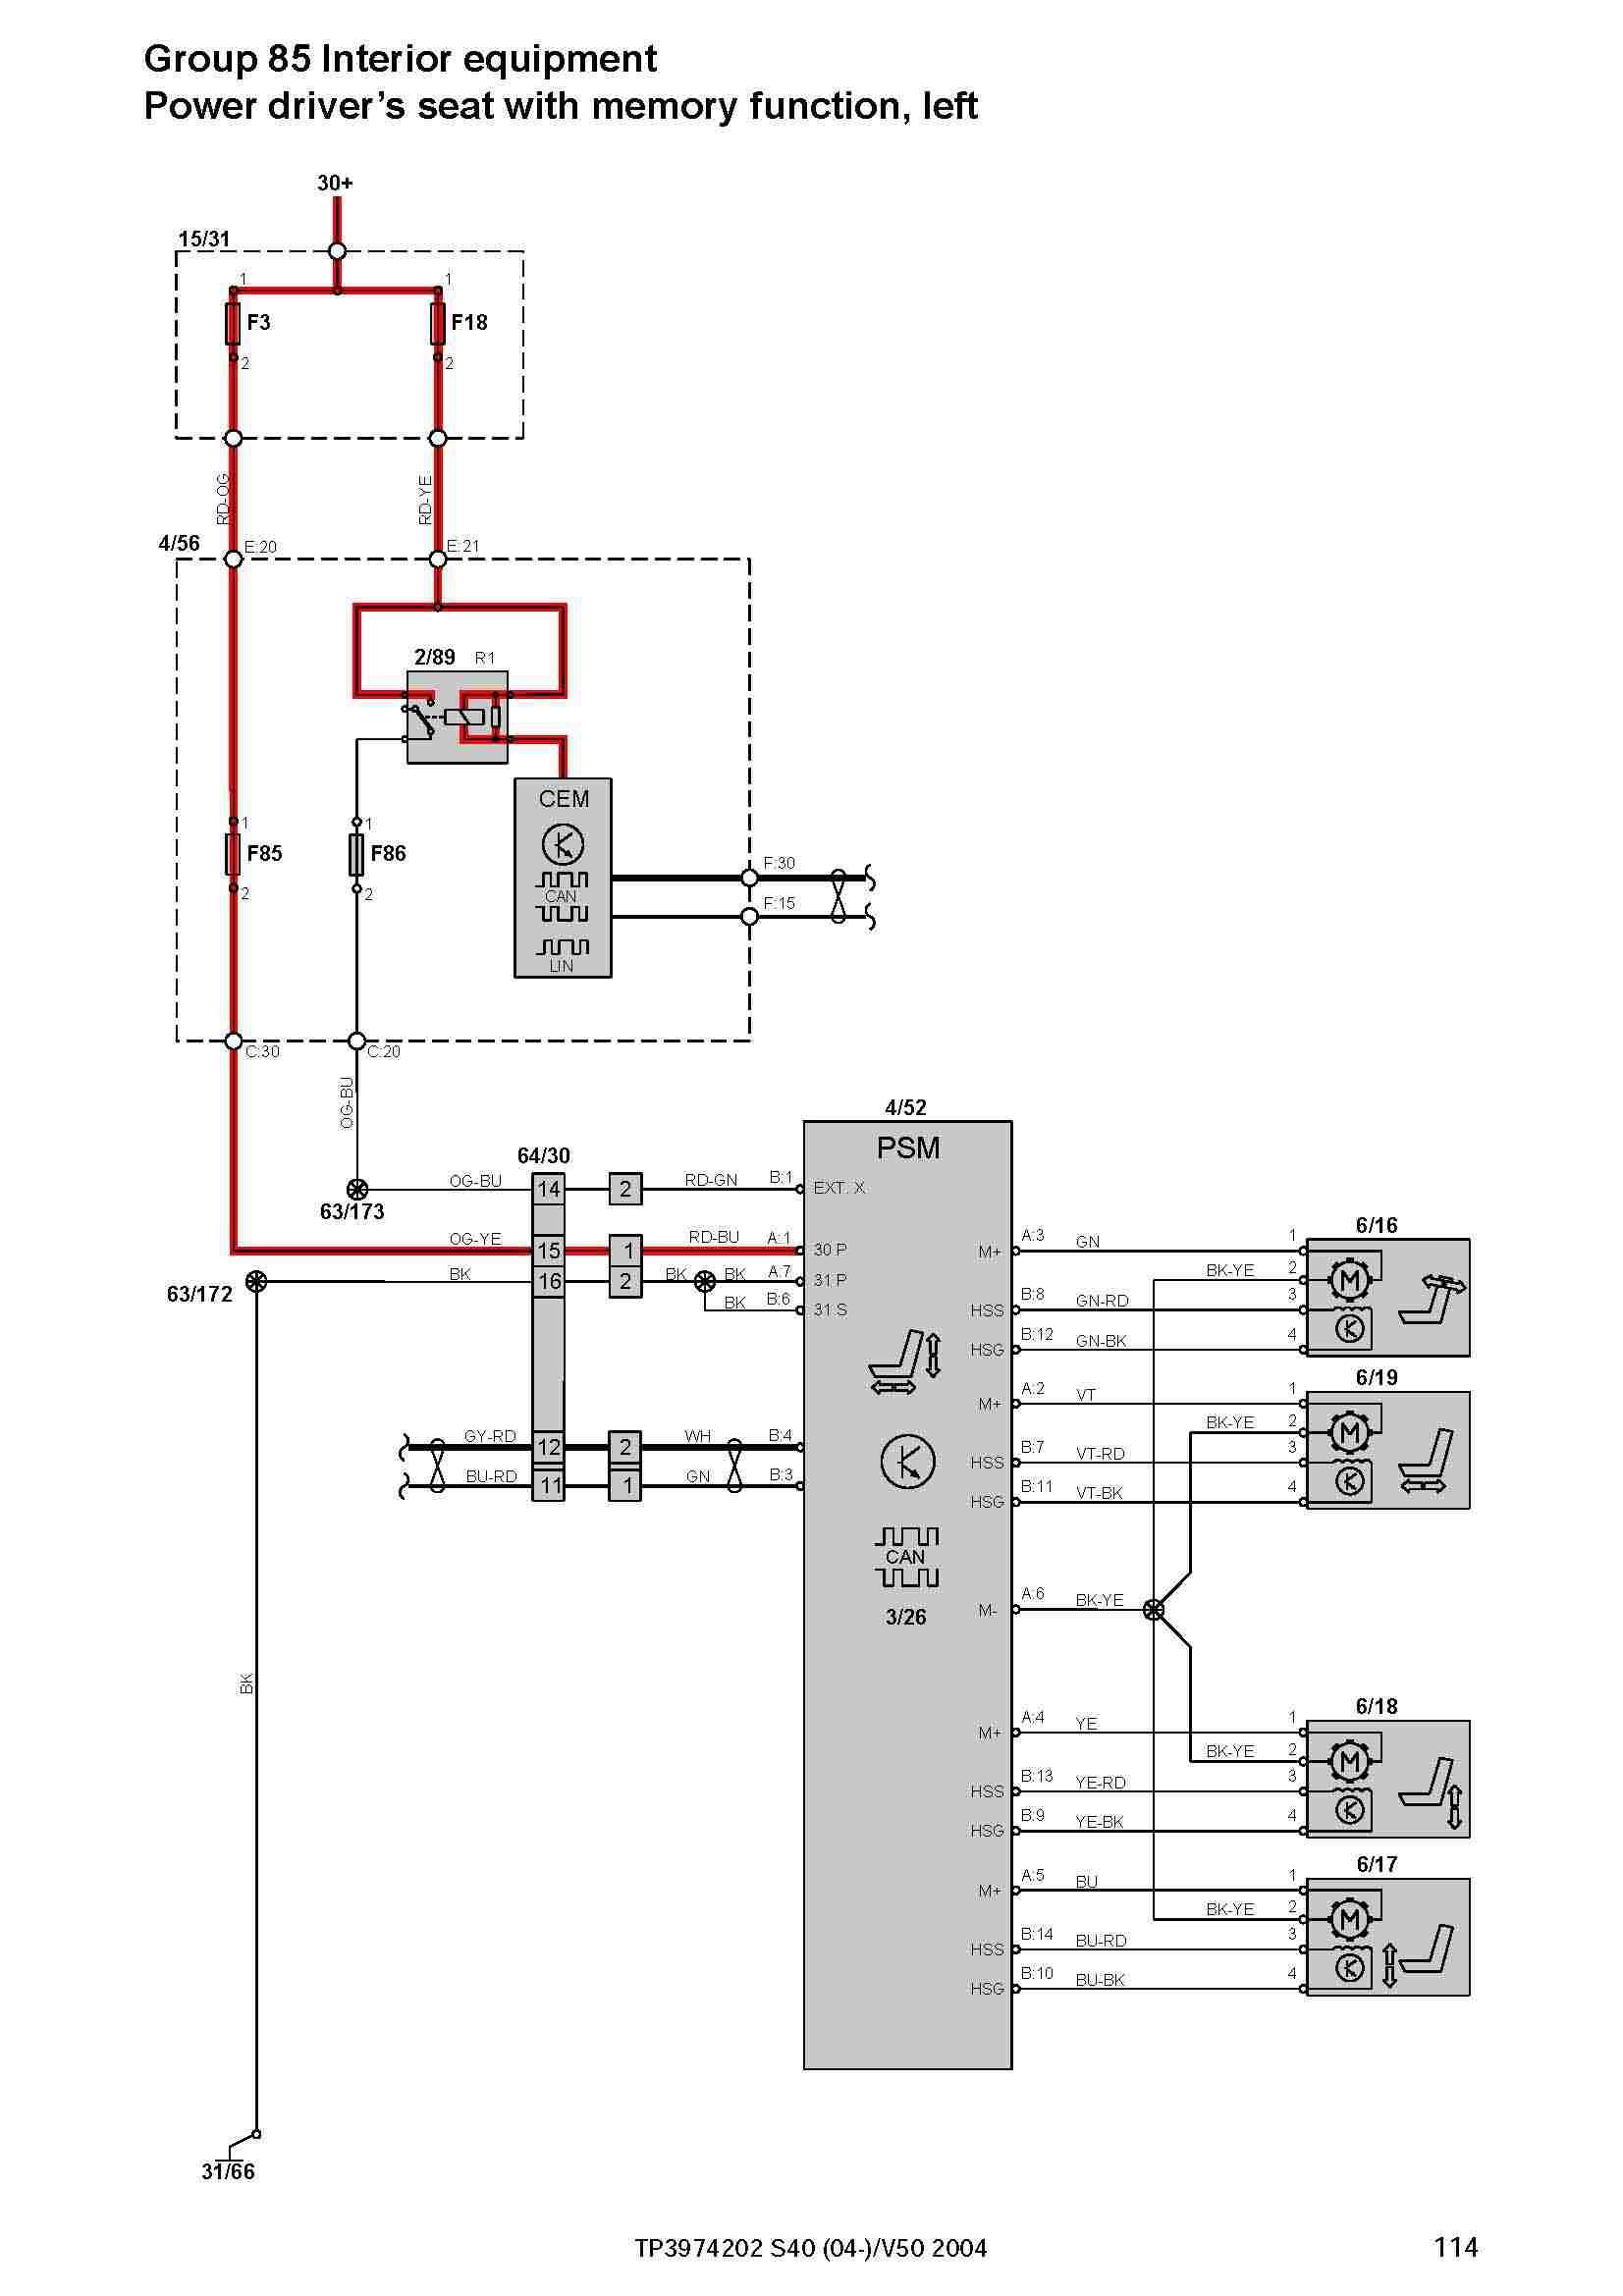 dta s40 pro wiring diagram evinrude etec 150 volvo diagrams v40 library 2006 v50 power seat problem forums